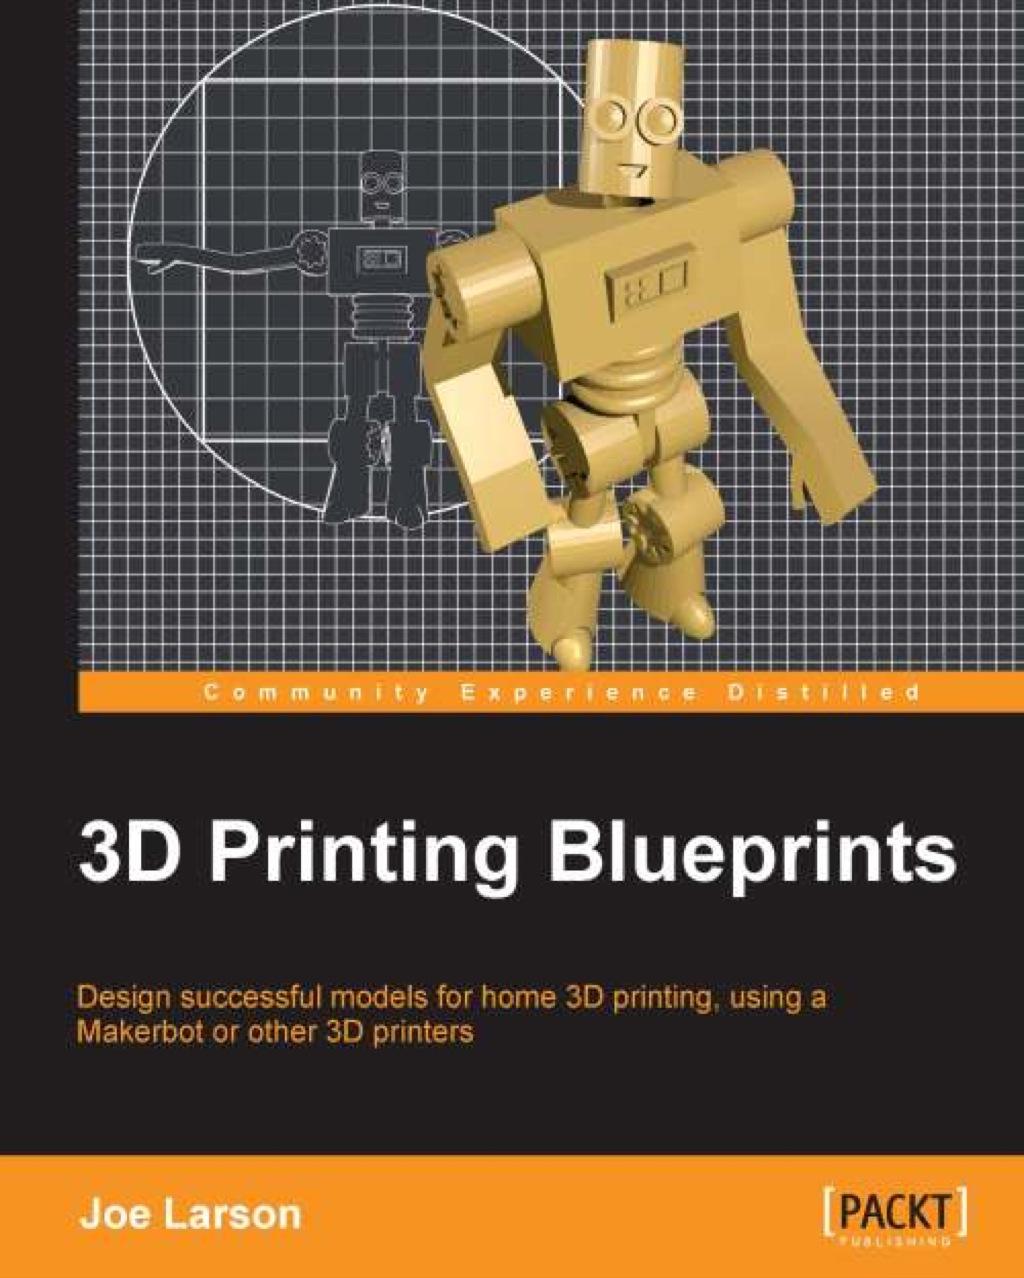 3D Printing Blueprints (eBook) (9781849697095) photo